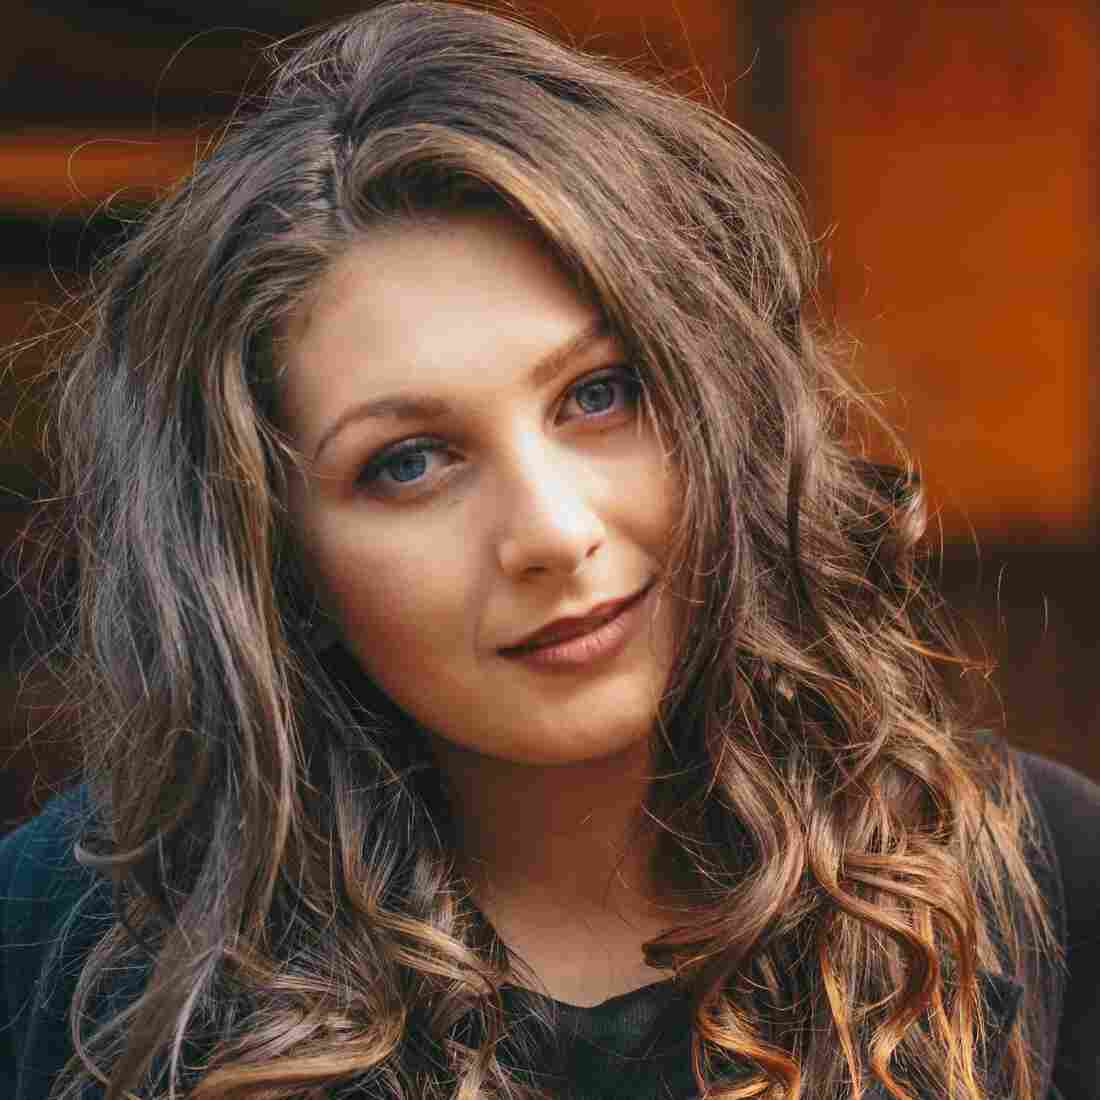 Rachael Fahim will perform at SXSW 2019.